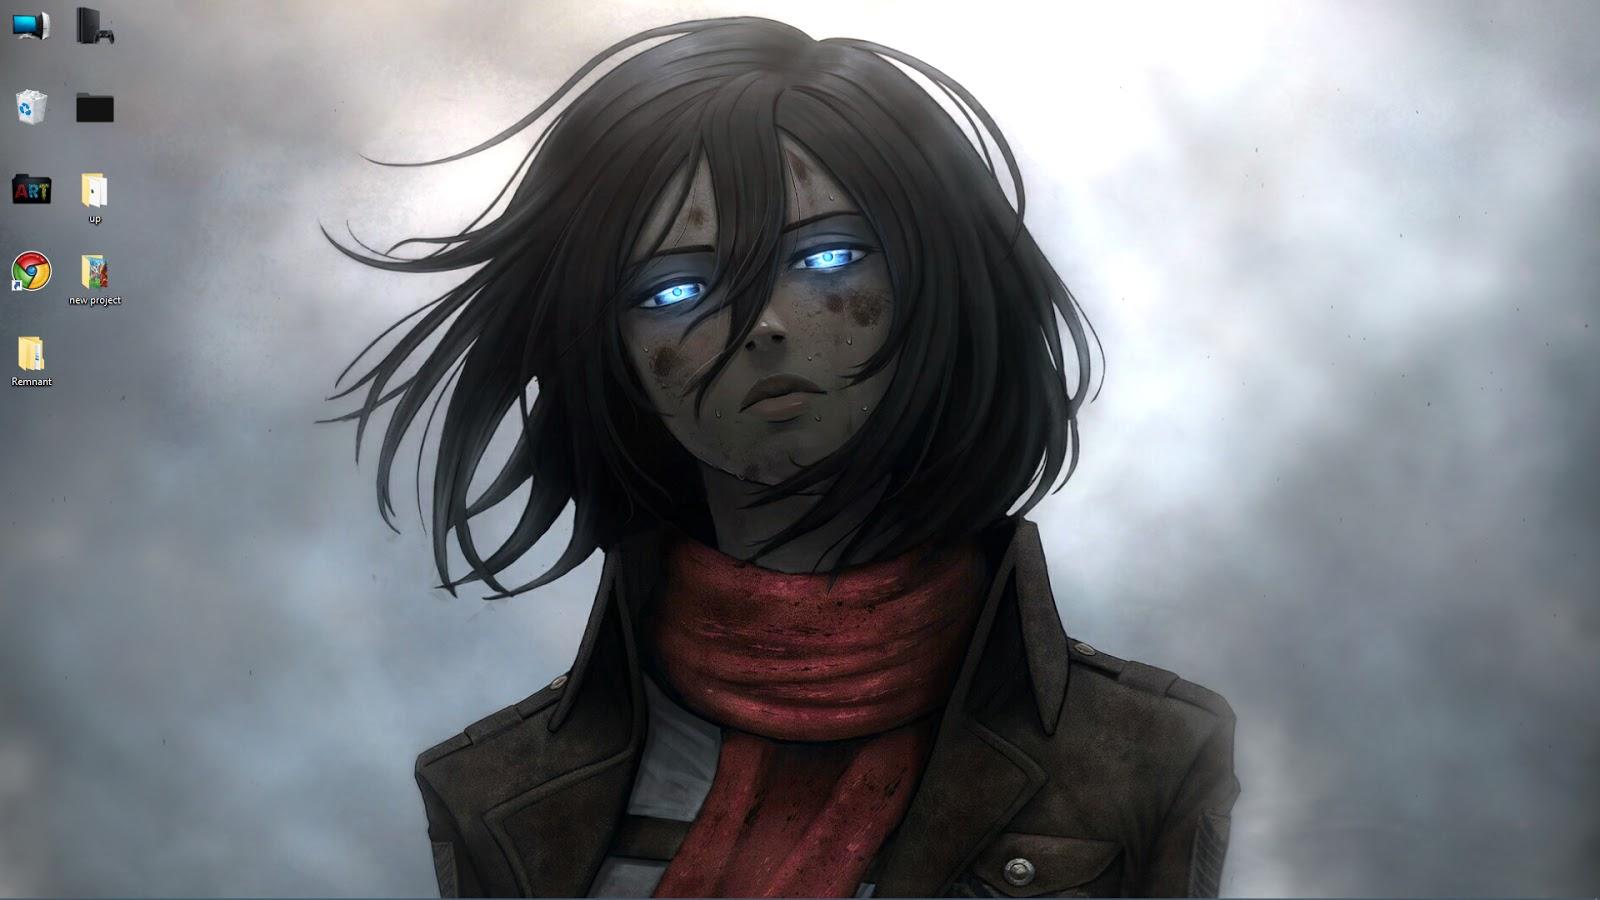 Annie leonhart, levi ackerman, shingeki no kyojin,. anime Mikasa Ackerman Attack on Titan live wallpaper free ...